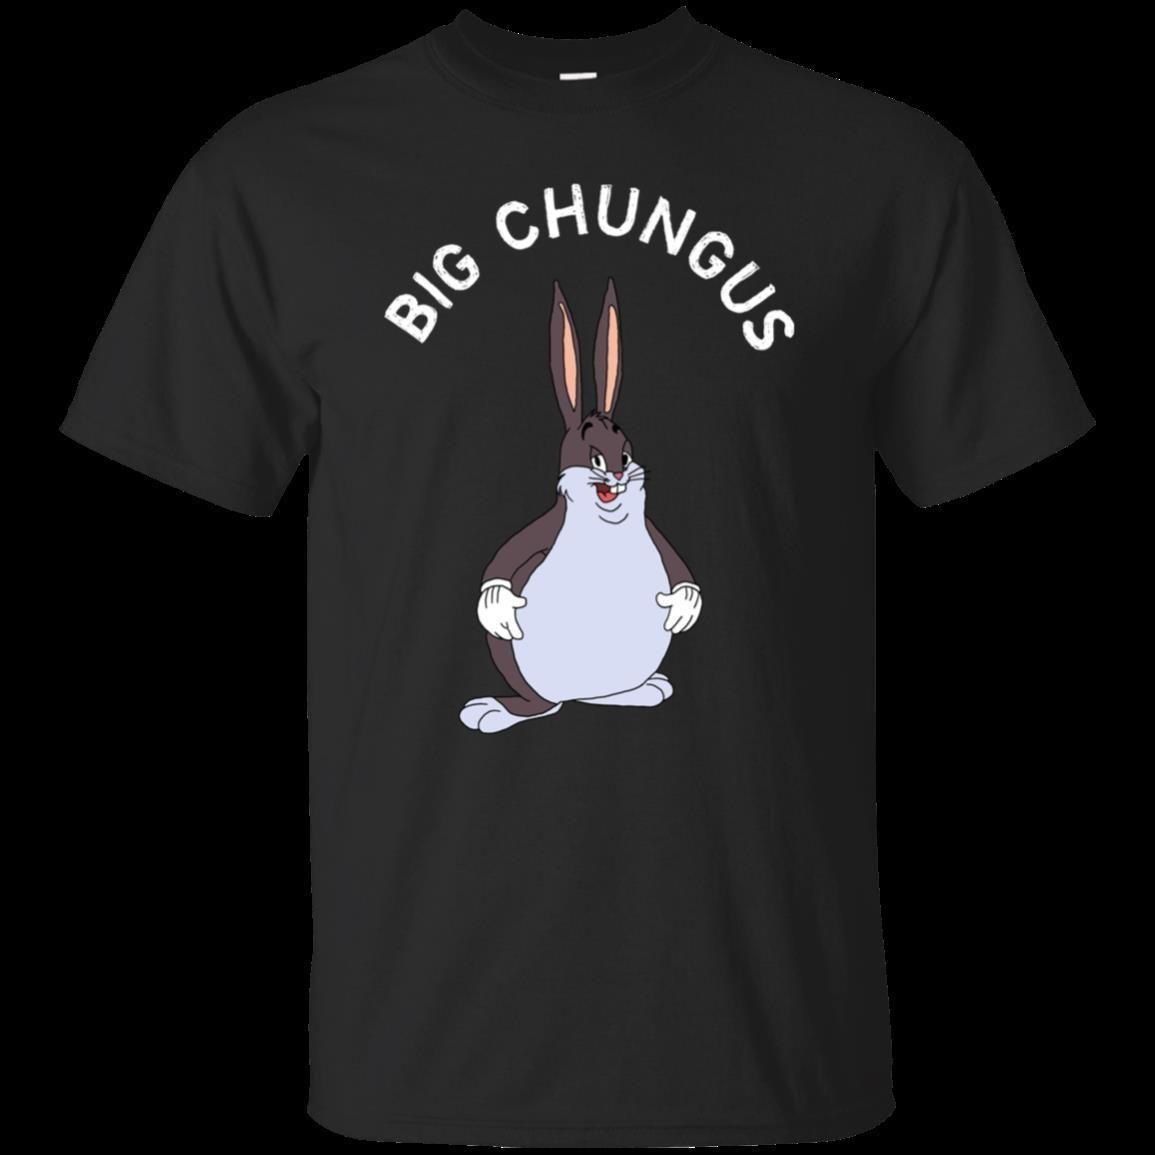 Black T Shirt Big Chungus Meme T Shirt For Men Size S 6xl Funny